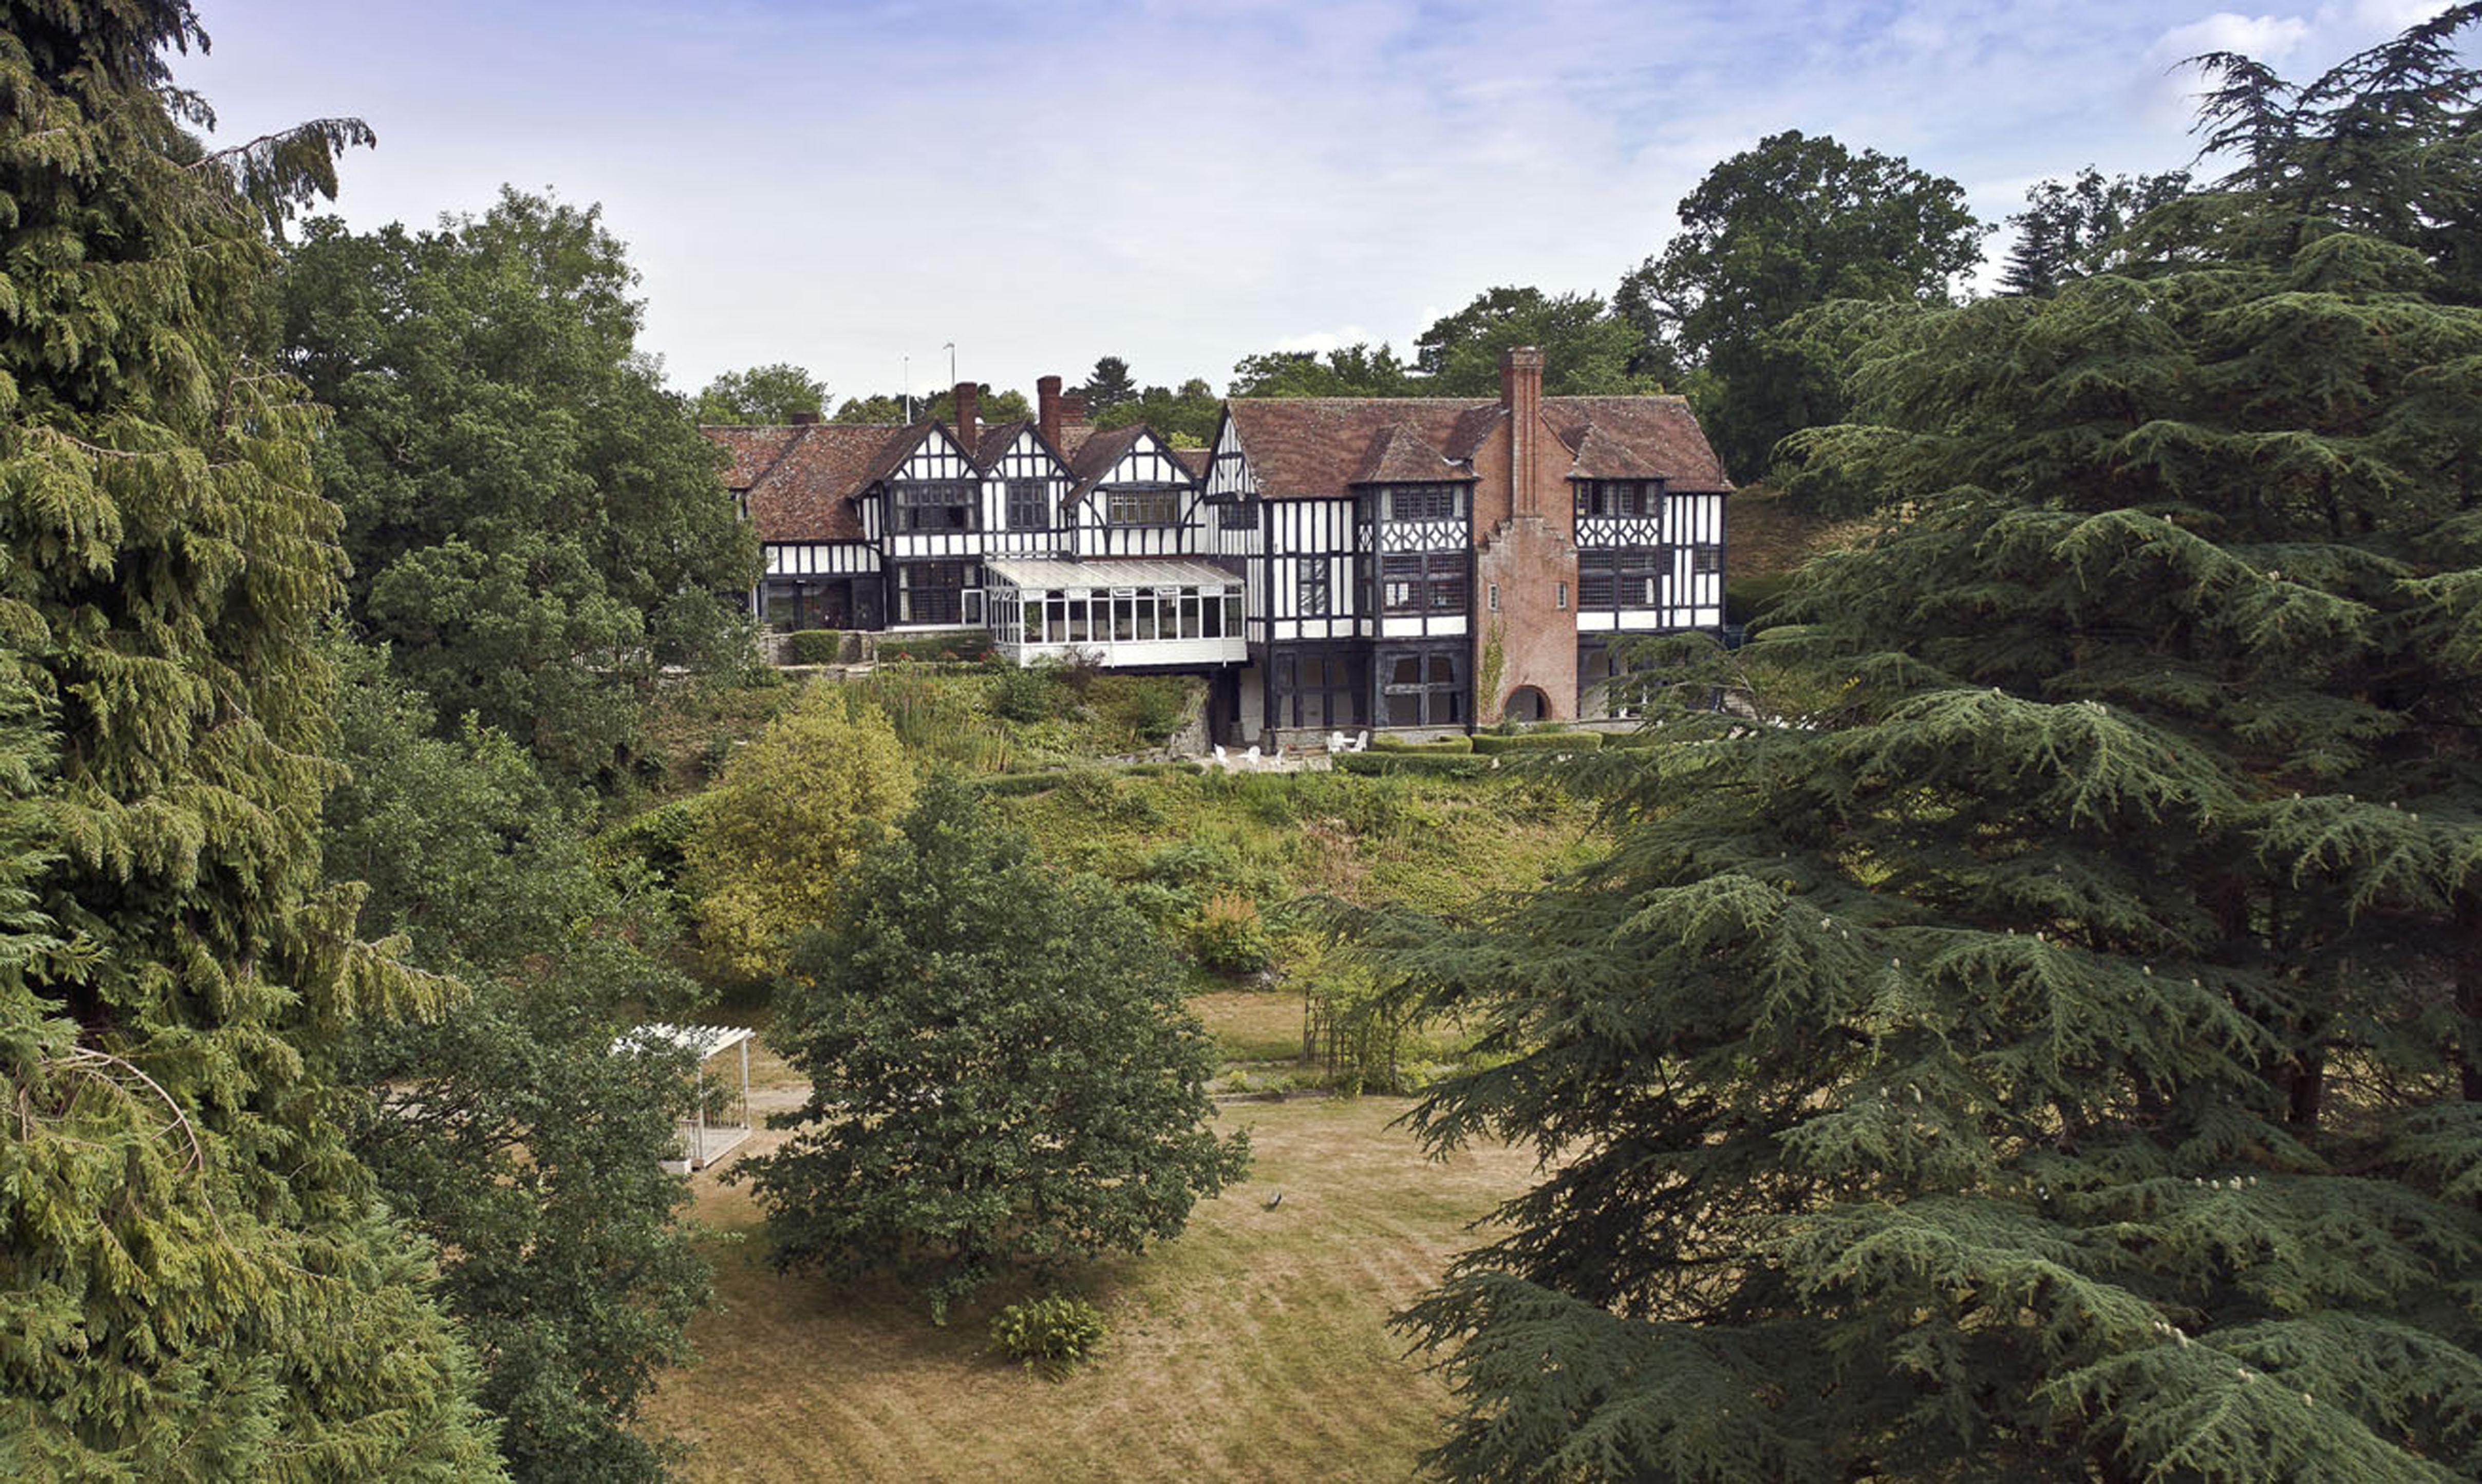 Cae Beris Manor